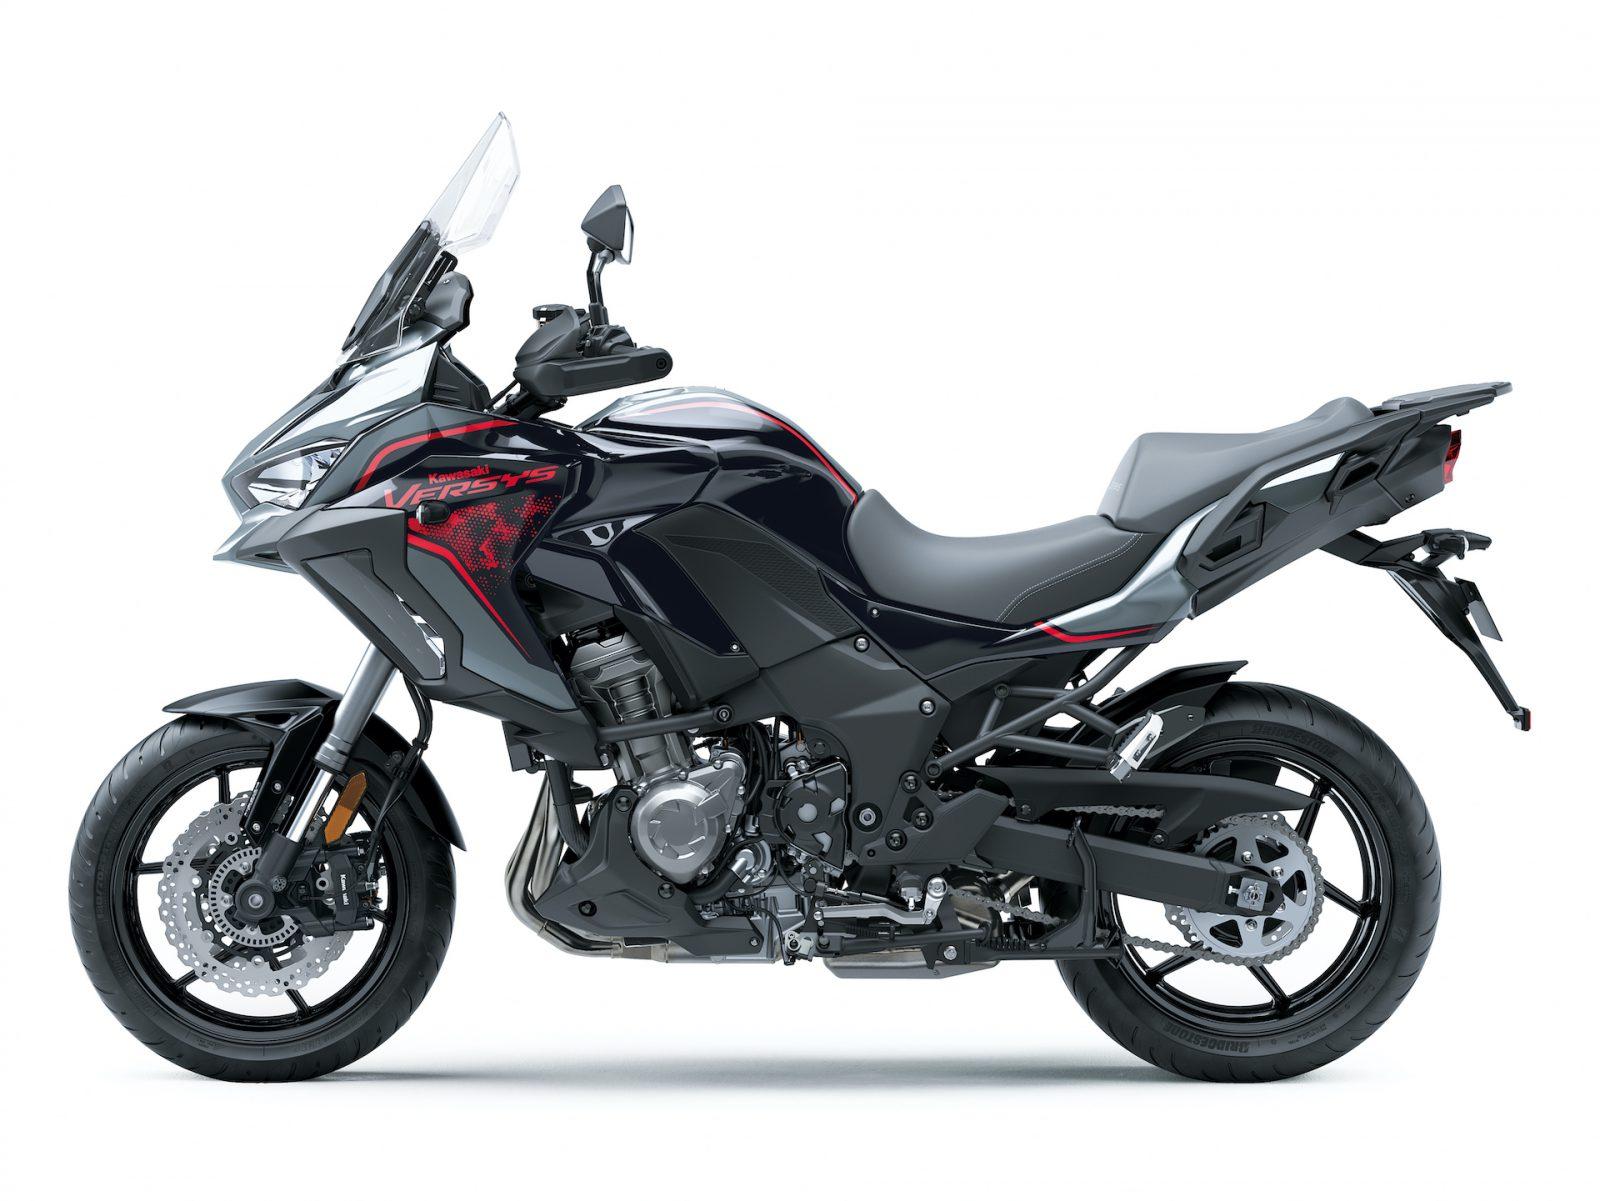 Deze Ducati 1199 Panigale Superleggera kost je dik 76.000 euro